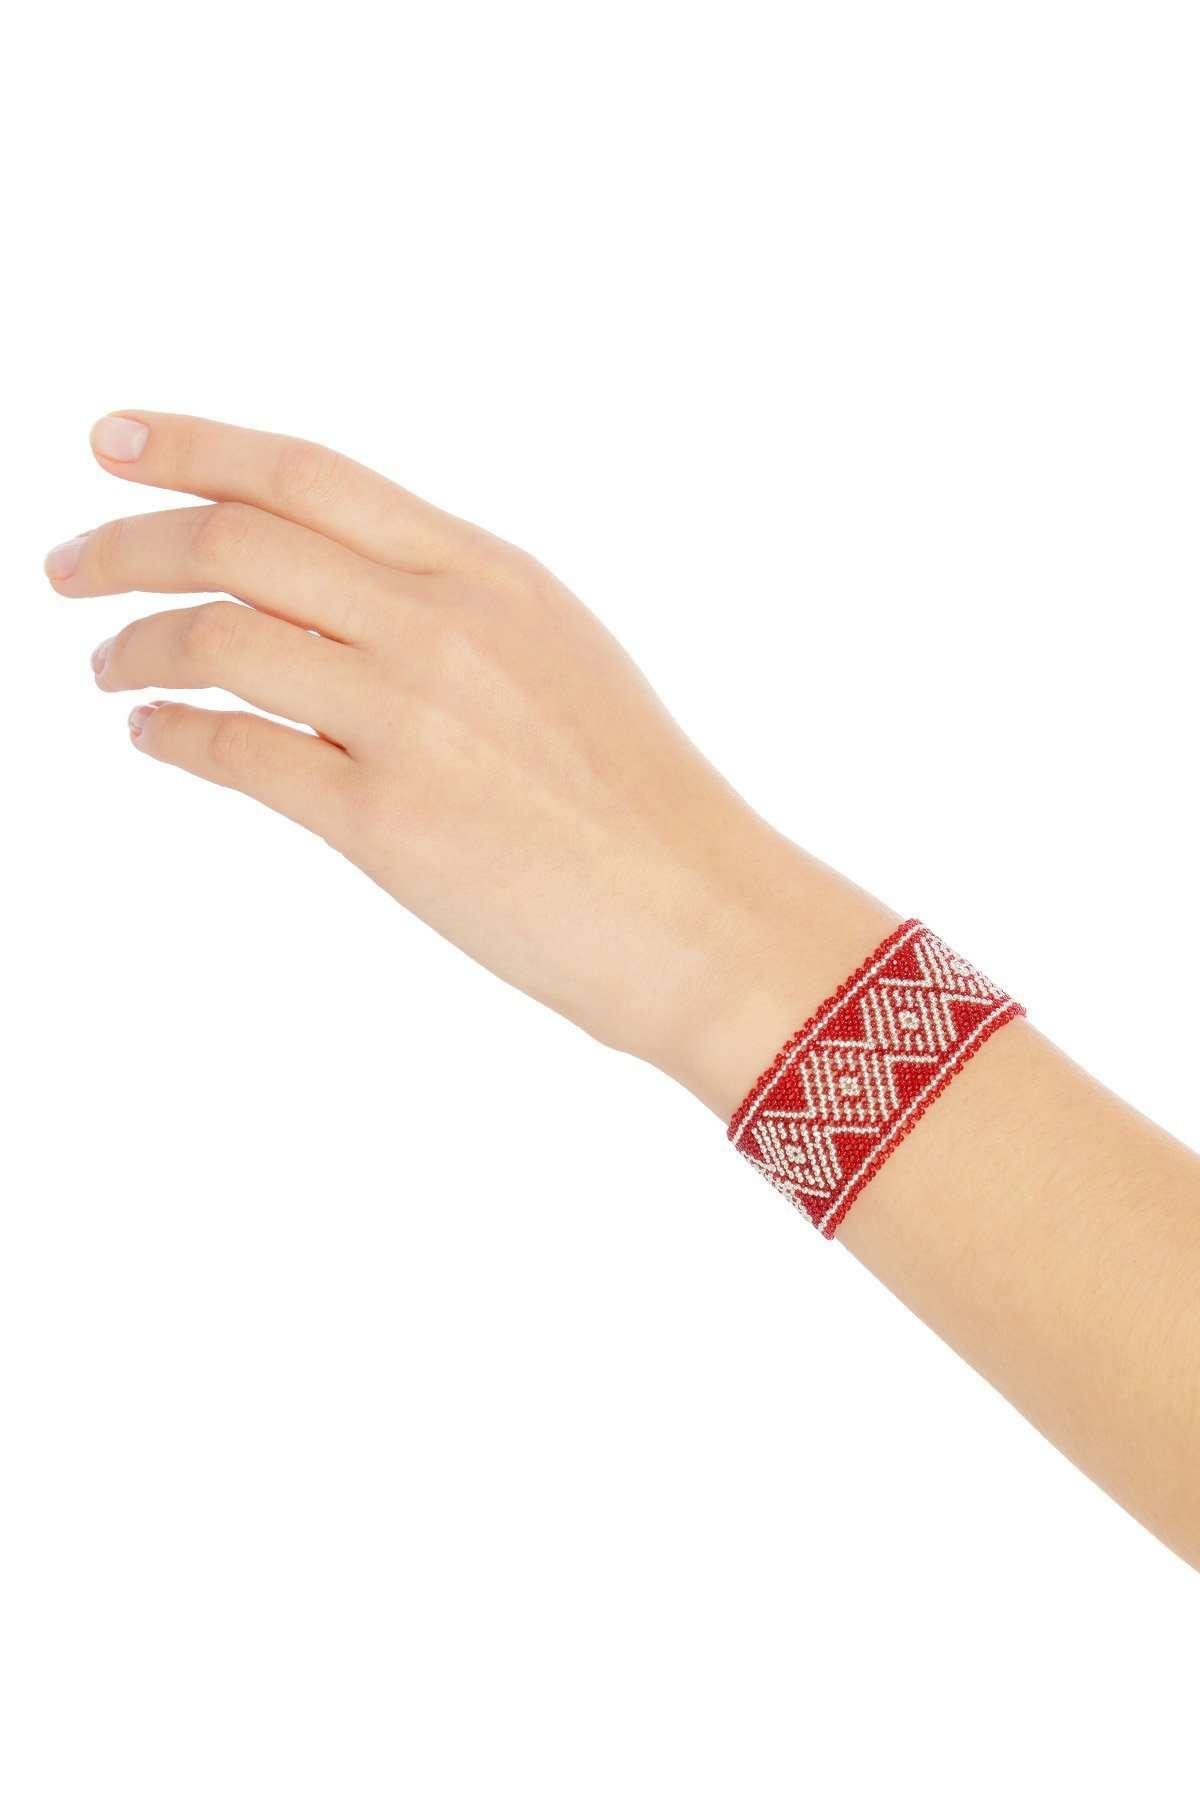 015-brazaletes-mediano-plata-rojo-alt1